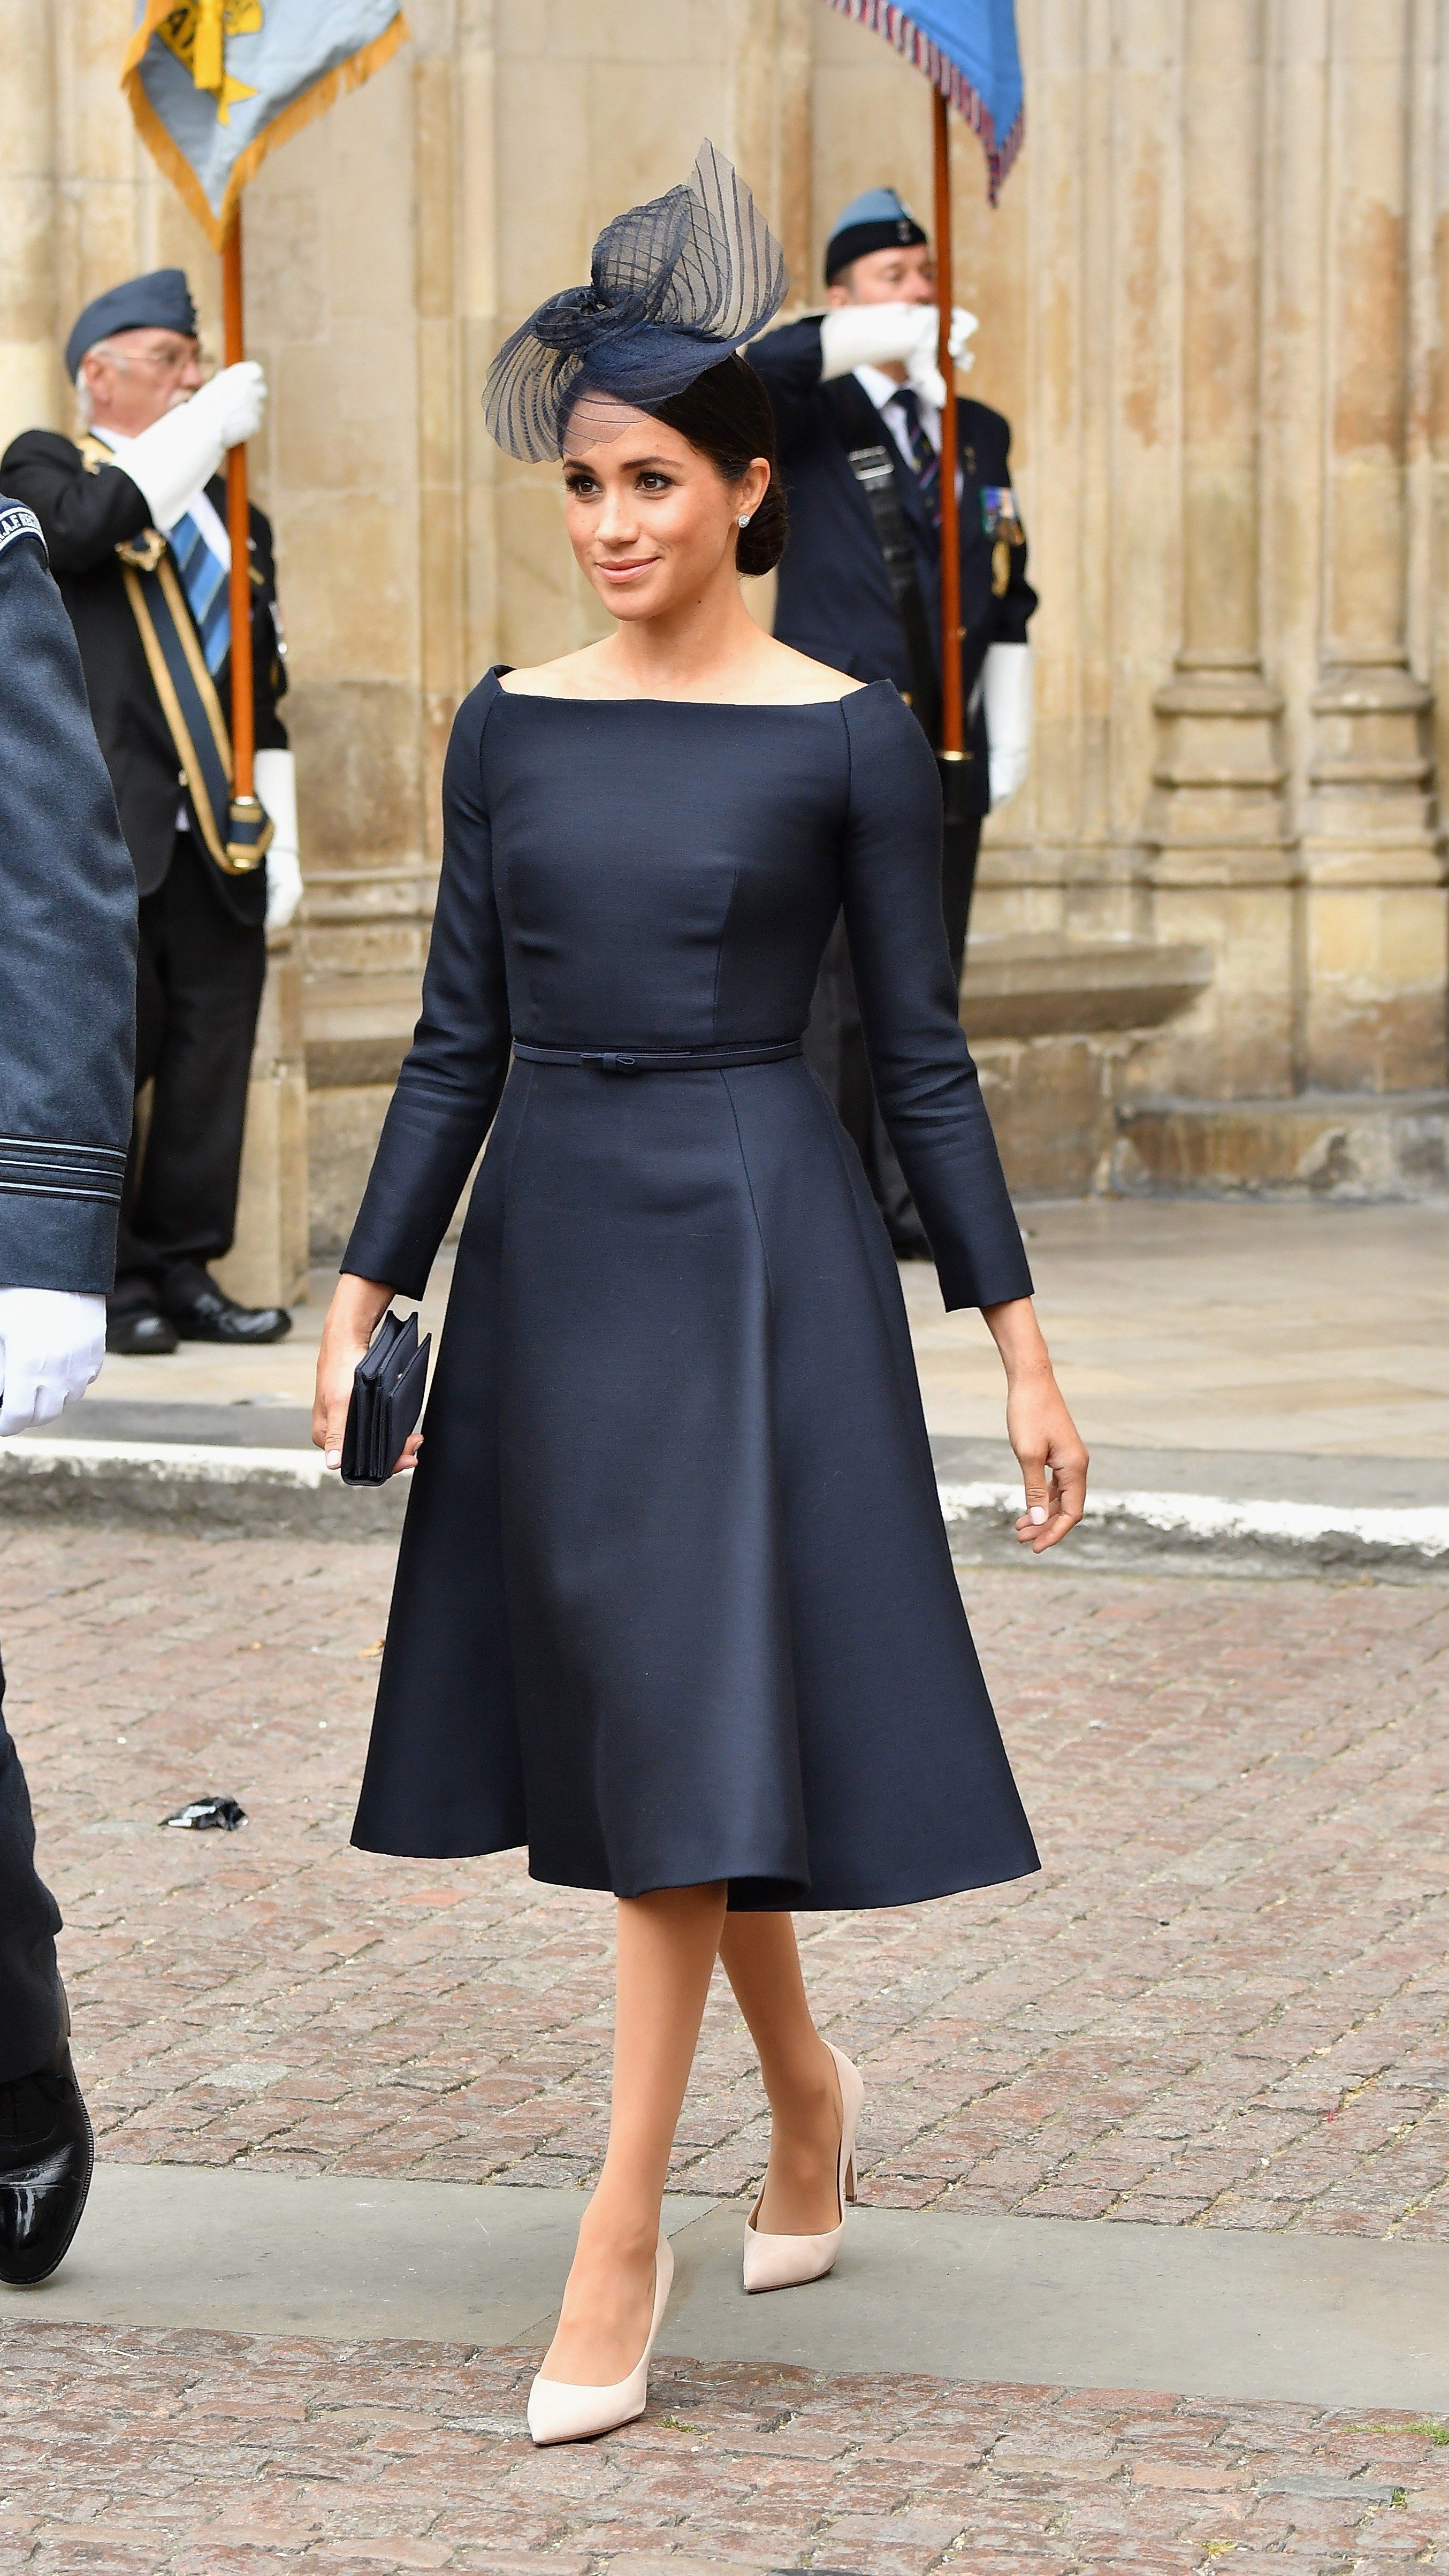 2507ea969aa Beautiful Meghan markle in a simple but elegant navy blue dress. Royal  Fashion